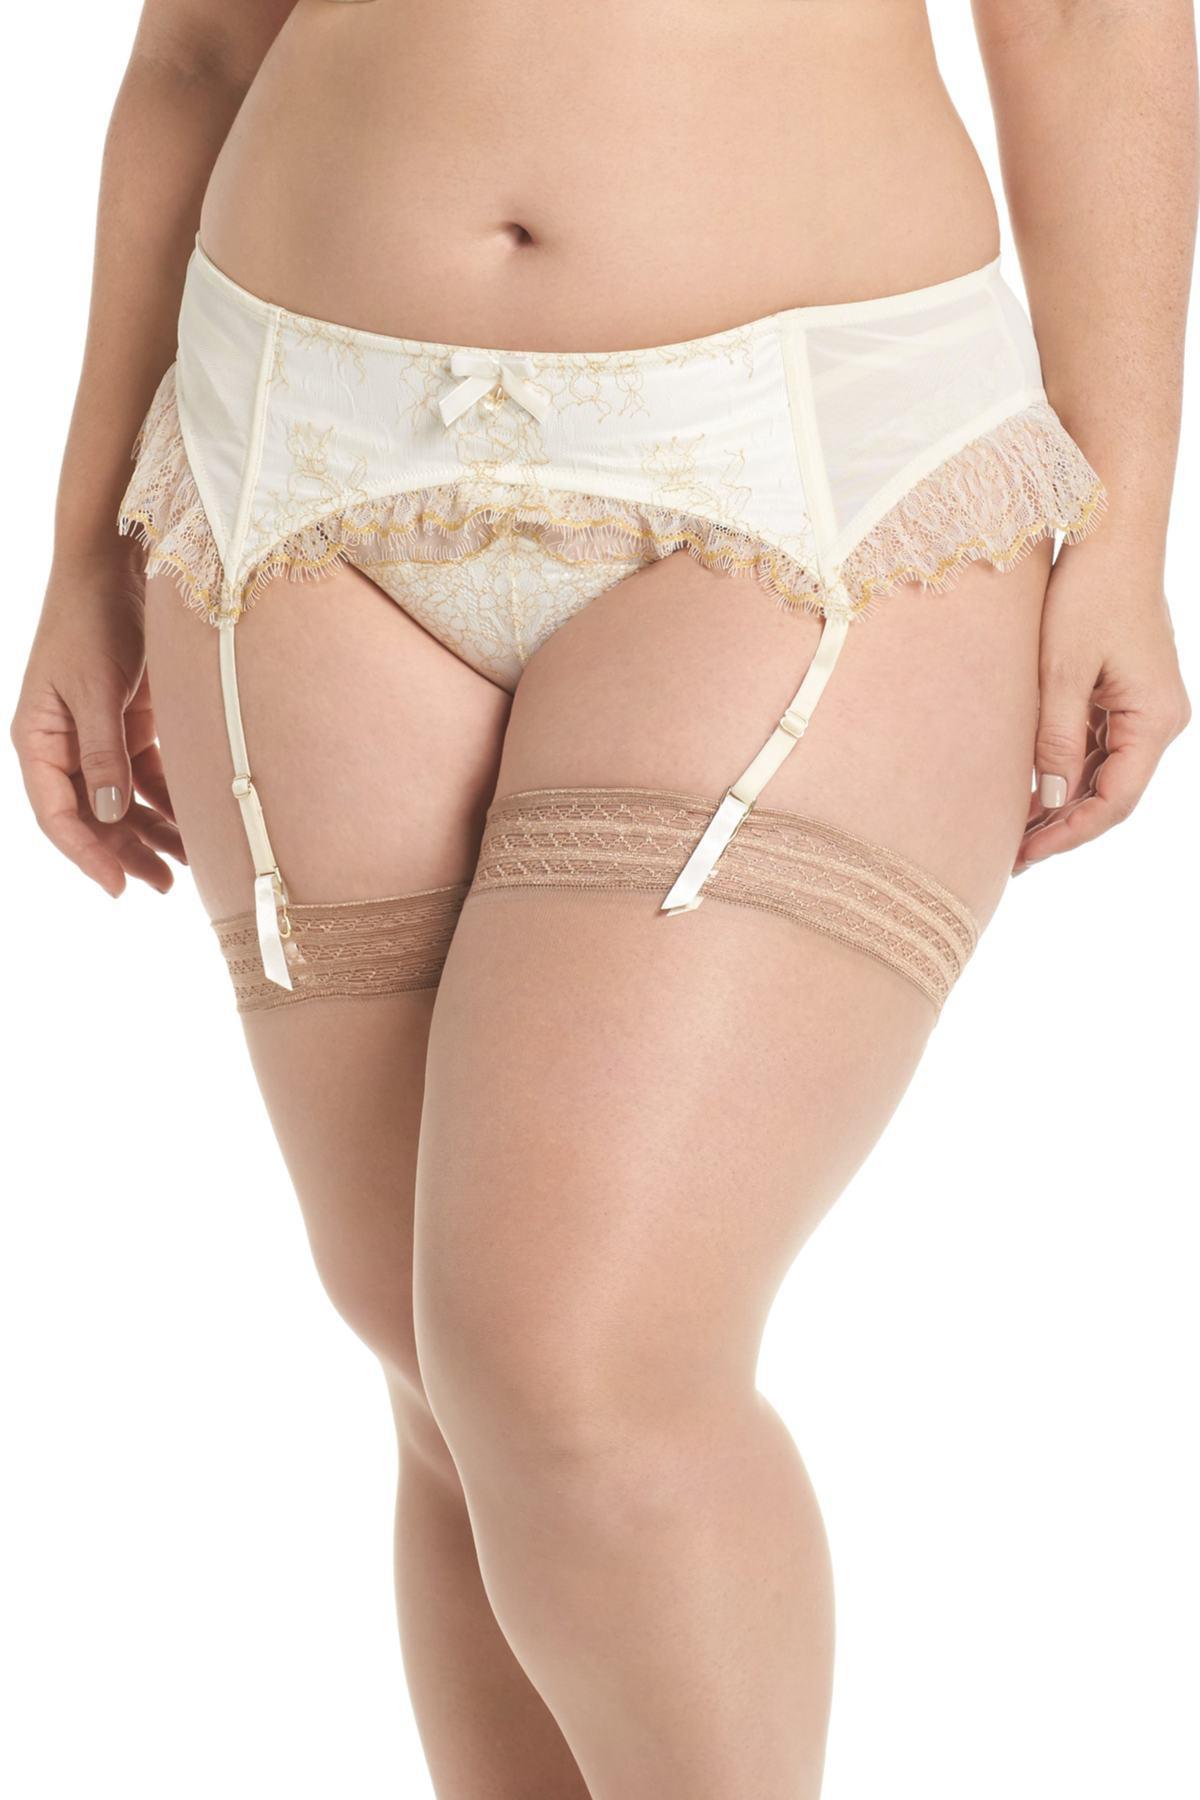 29380dd87e30 Playful Promises Karine Lace Garter Belt (plus Size) in White - Lyst